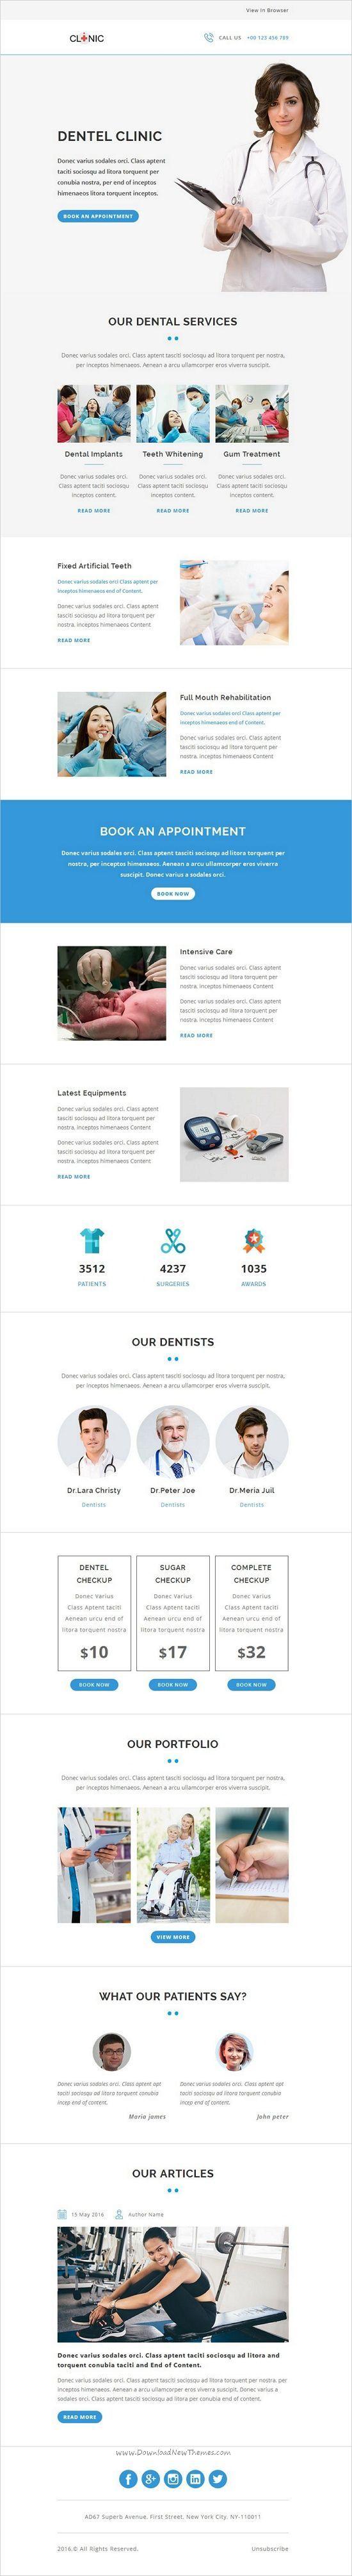 healthcare newsletter templates